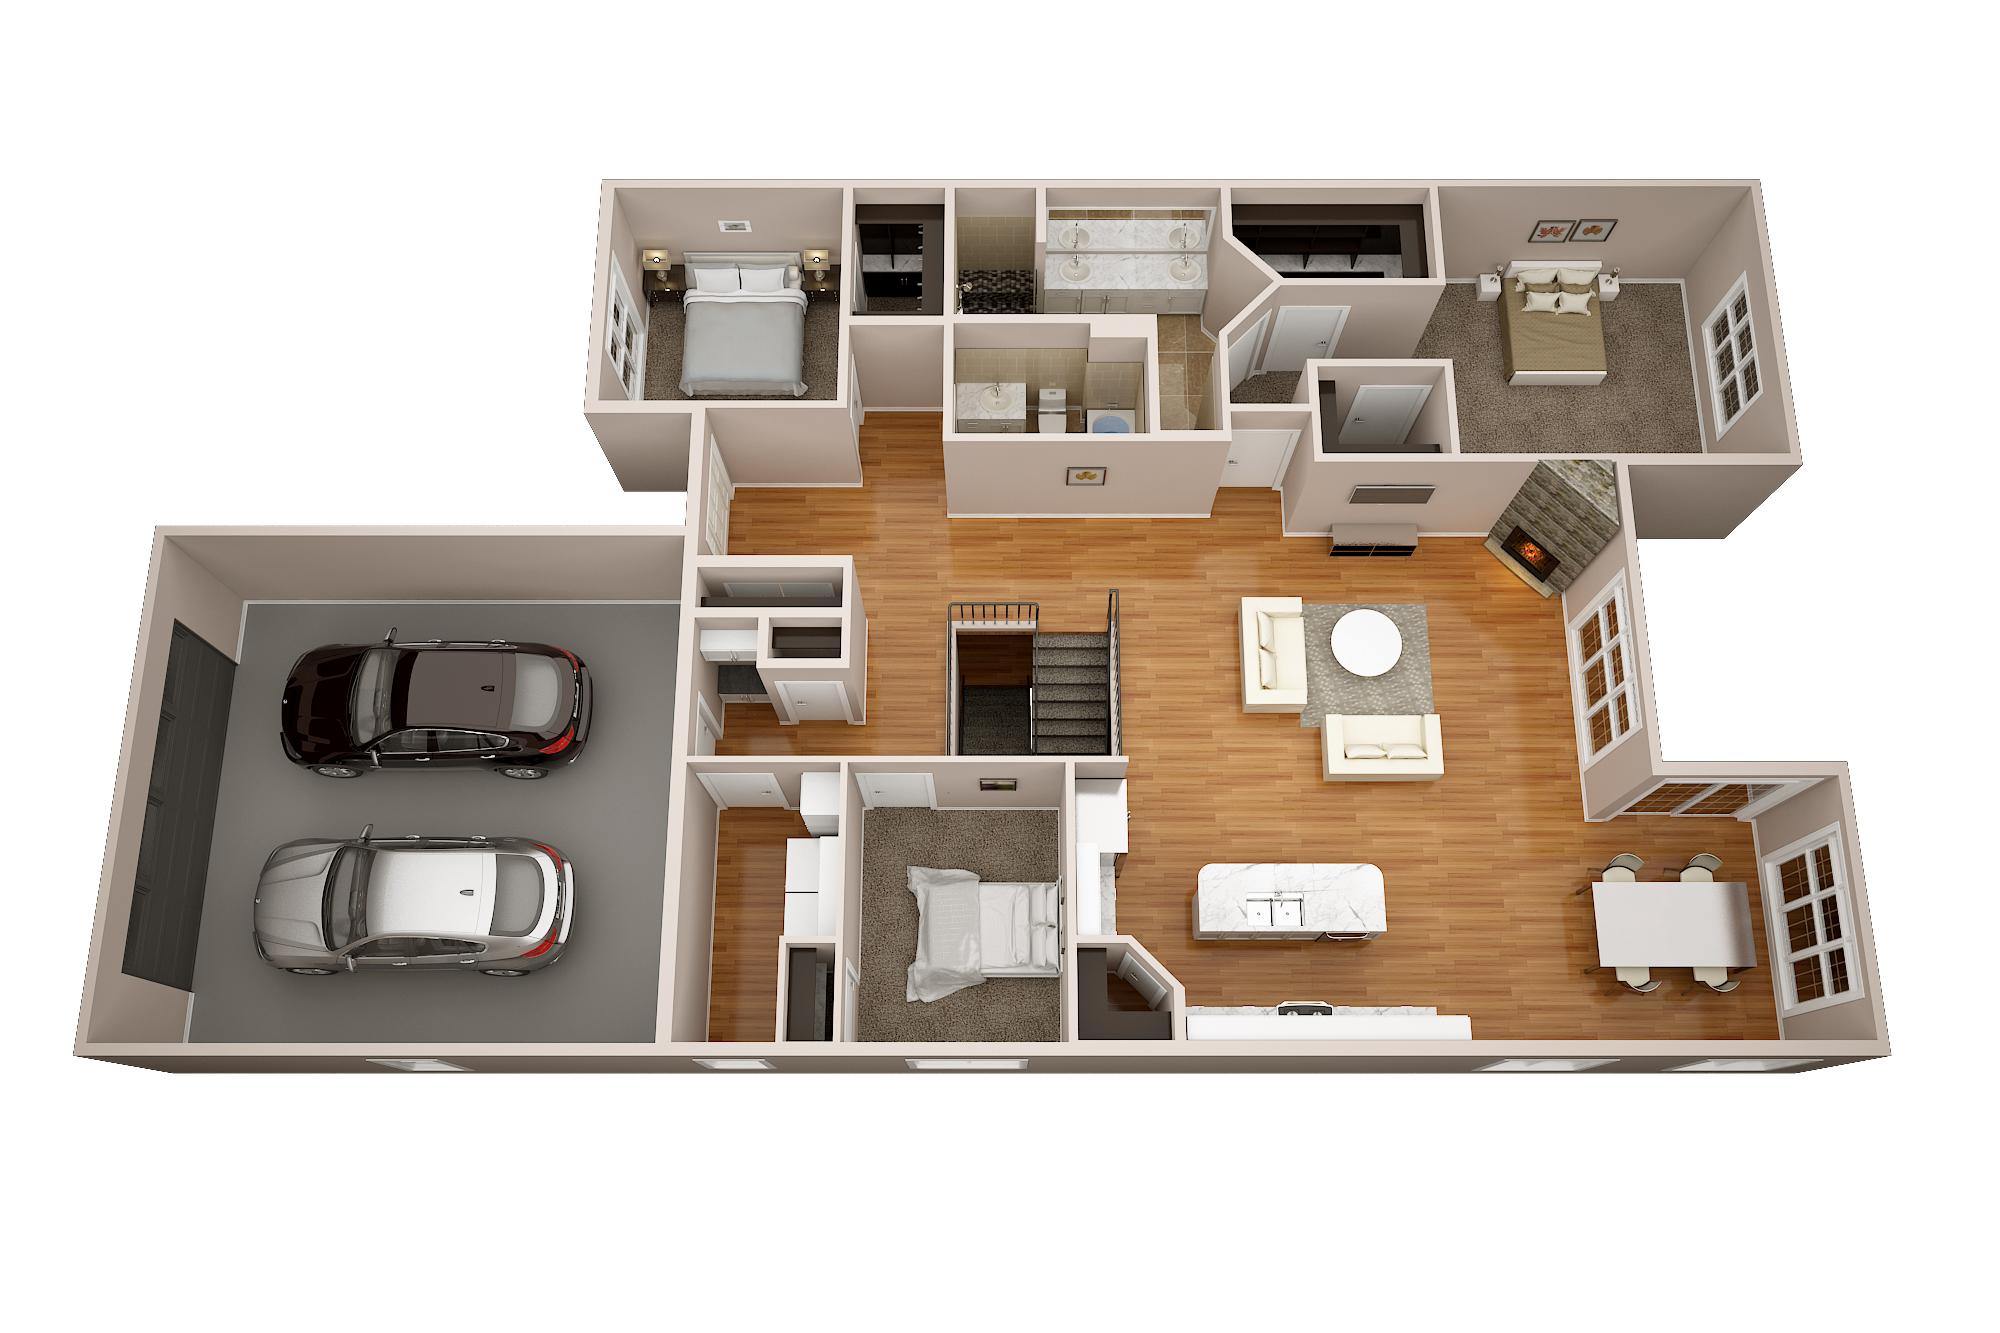 Berg_VR_D_Floor Plan.jpg